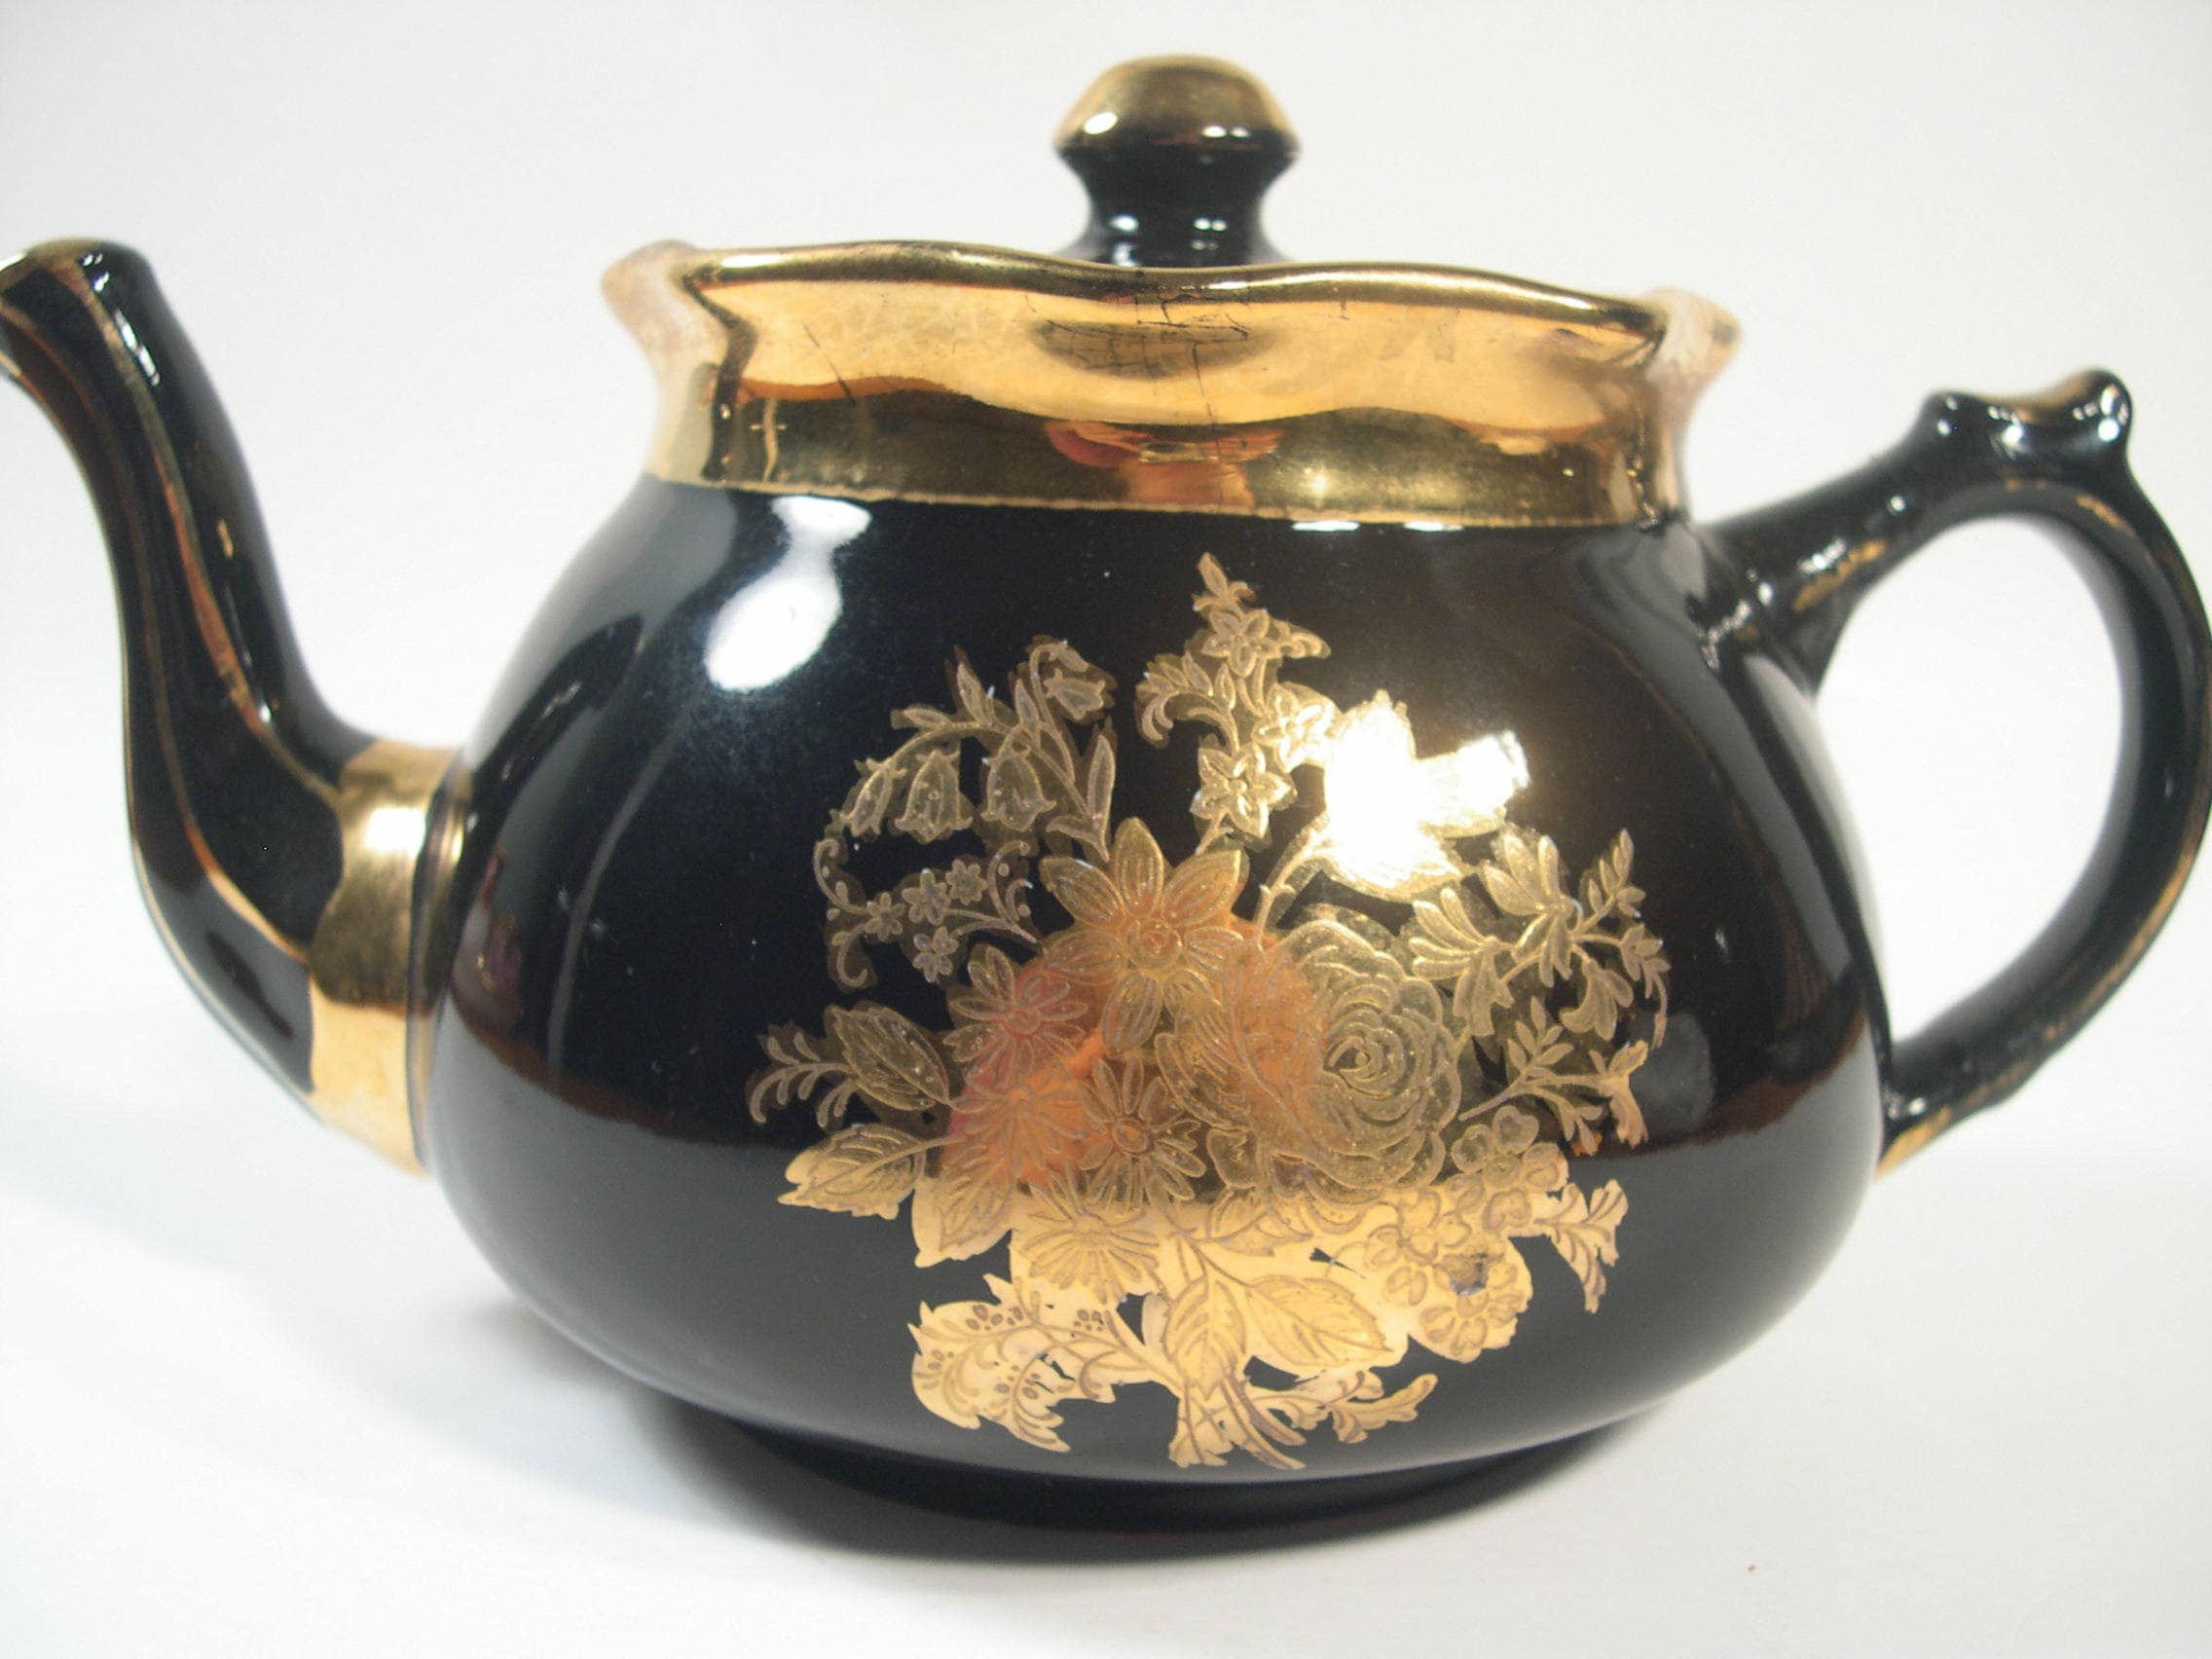 Arthur Wood Vintage Teapot Made In England